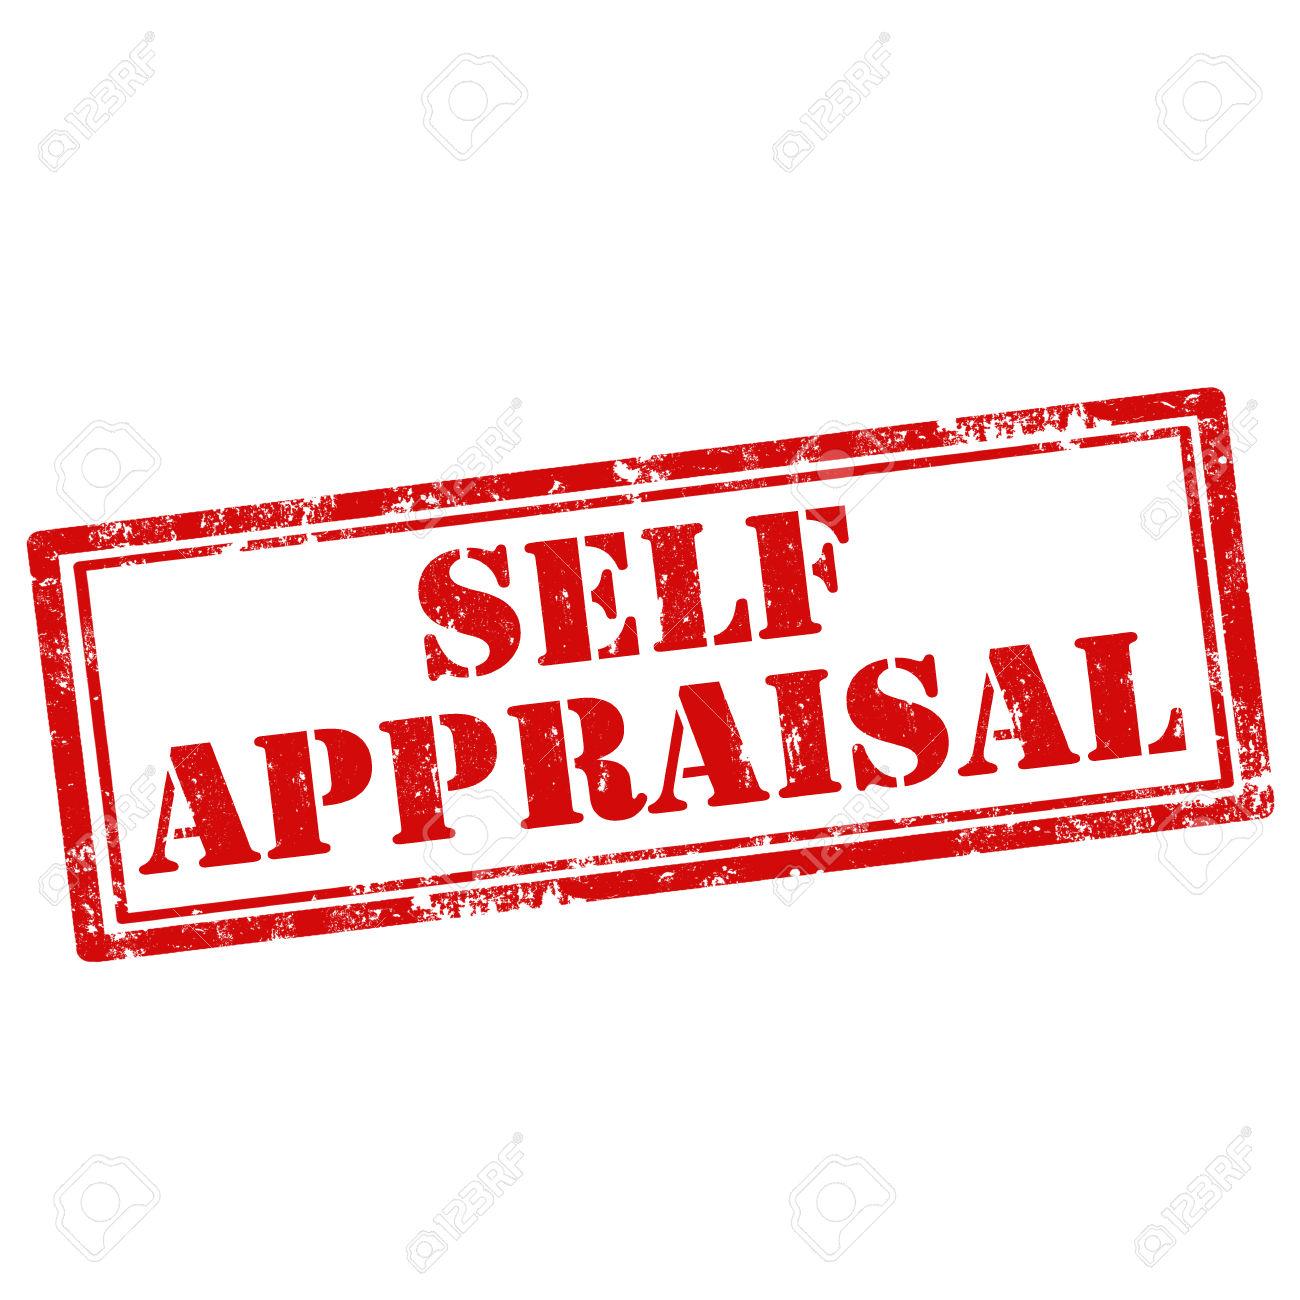 Self appraisal clipart.